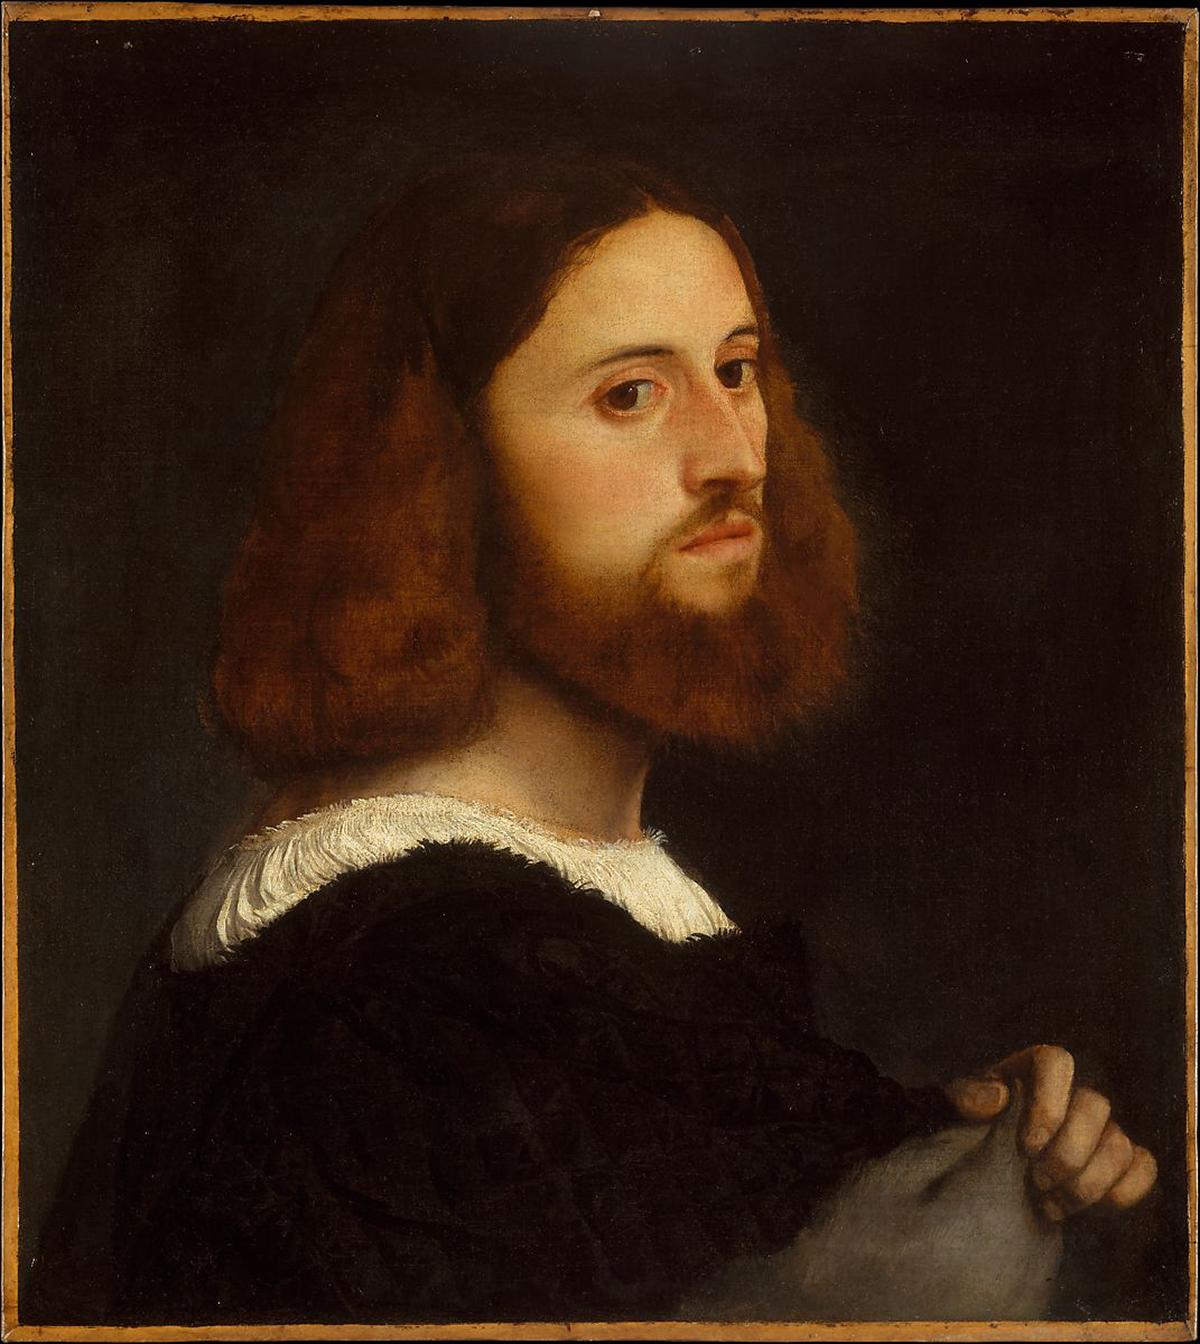 Portrait of a Man - Vecellio